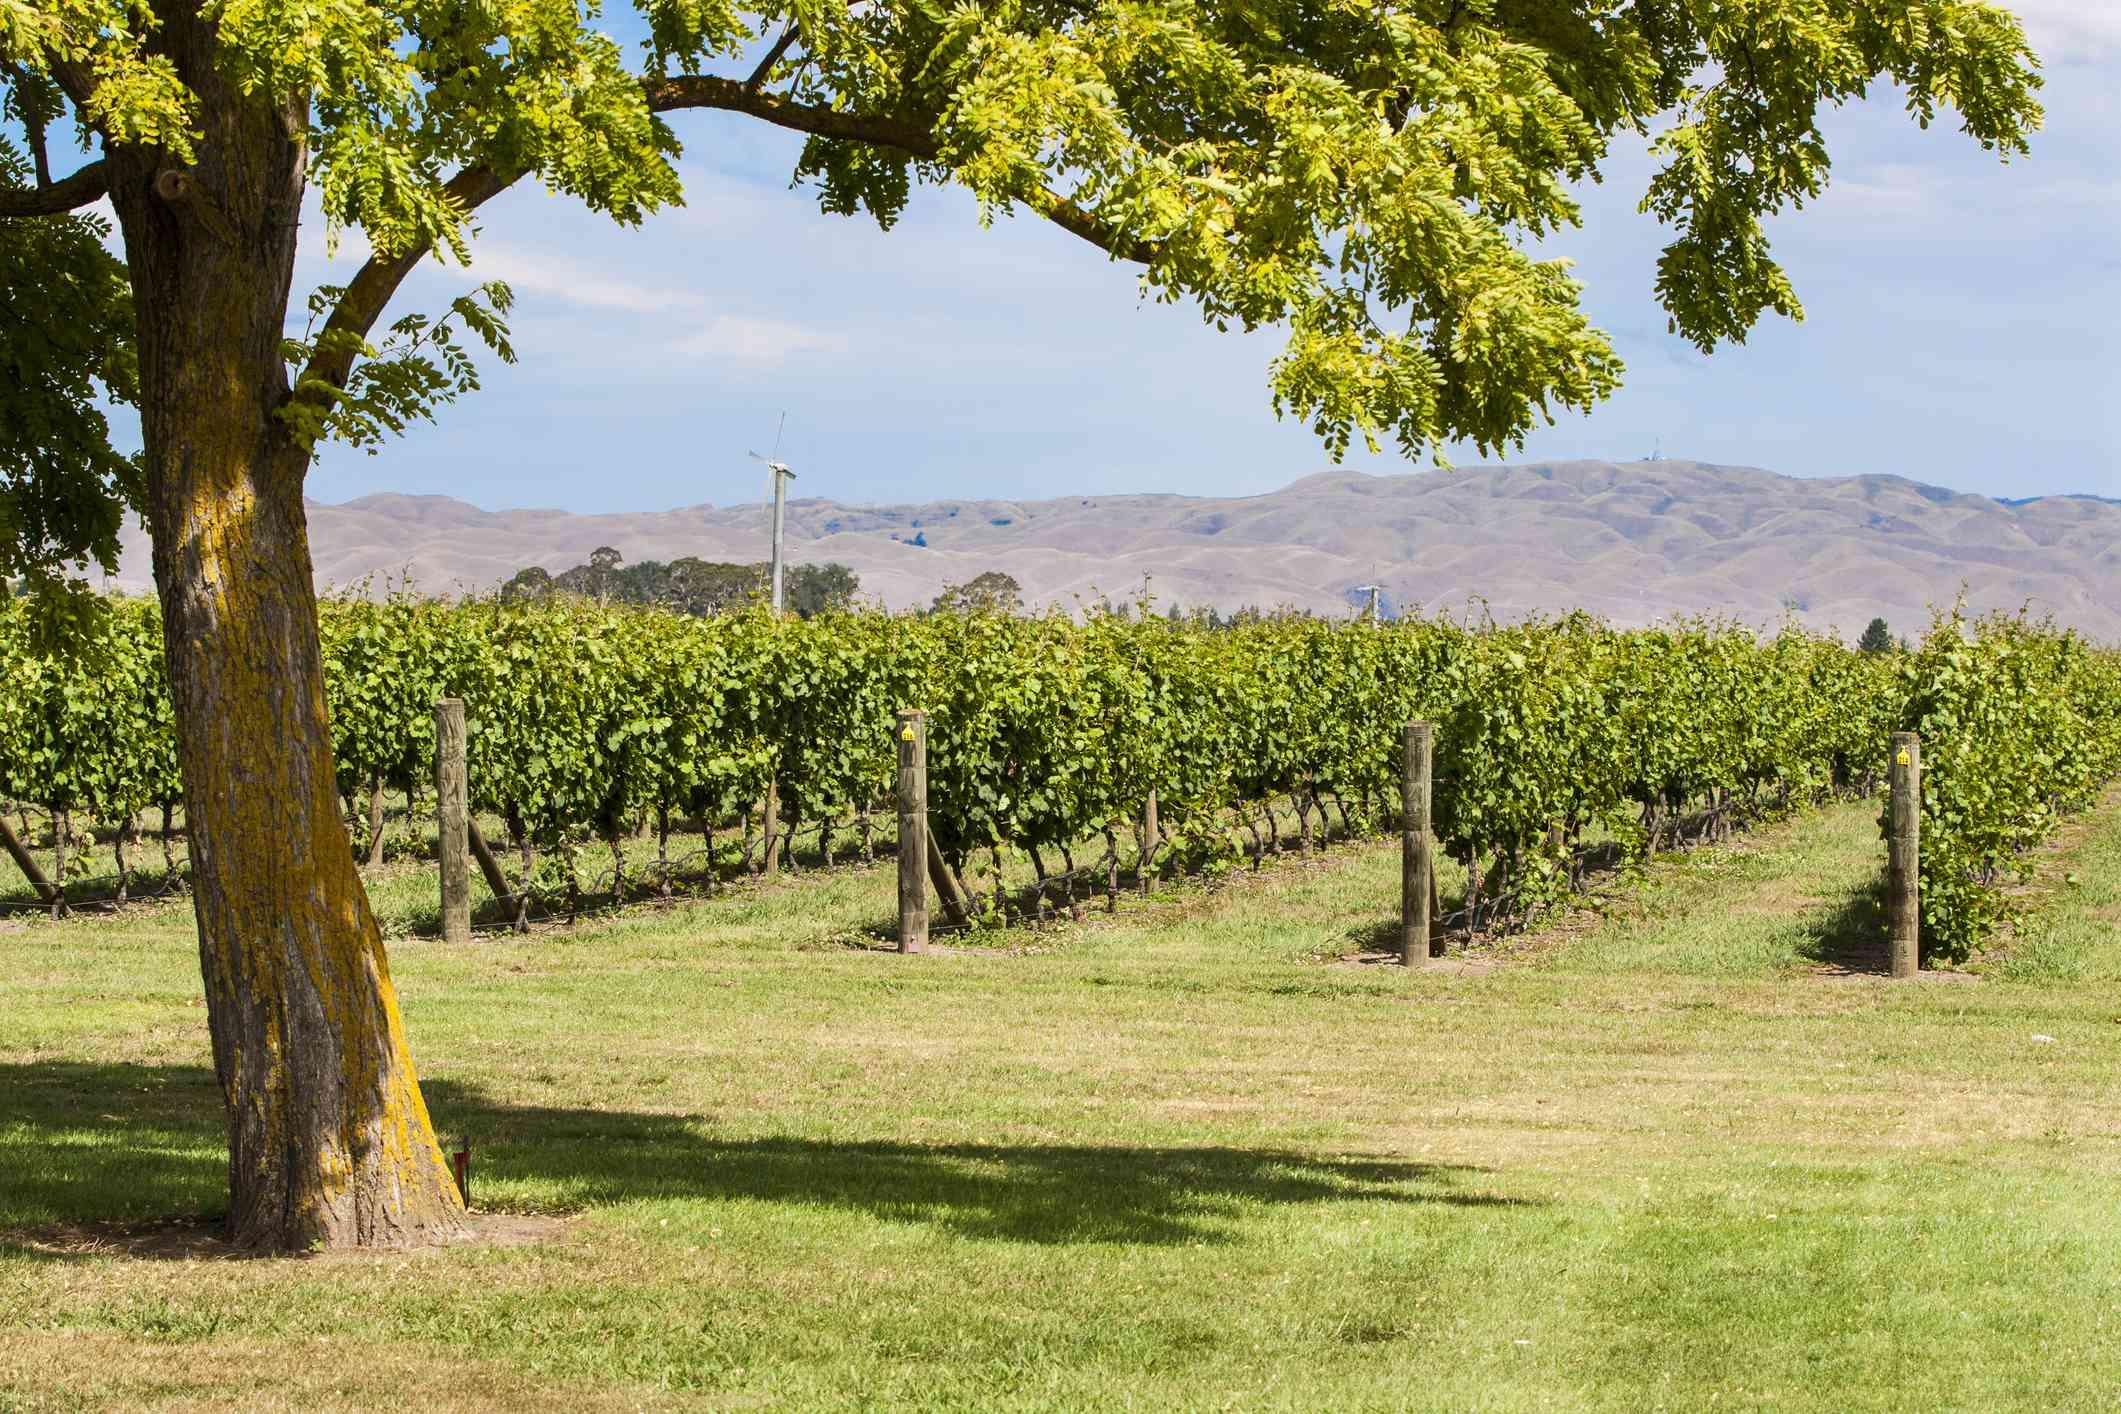 Vineyards of Hawke's Bay. Photo: Scotty Robson/Getty